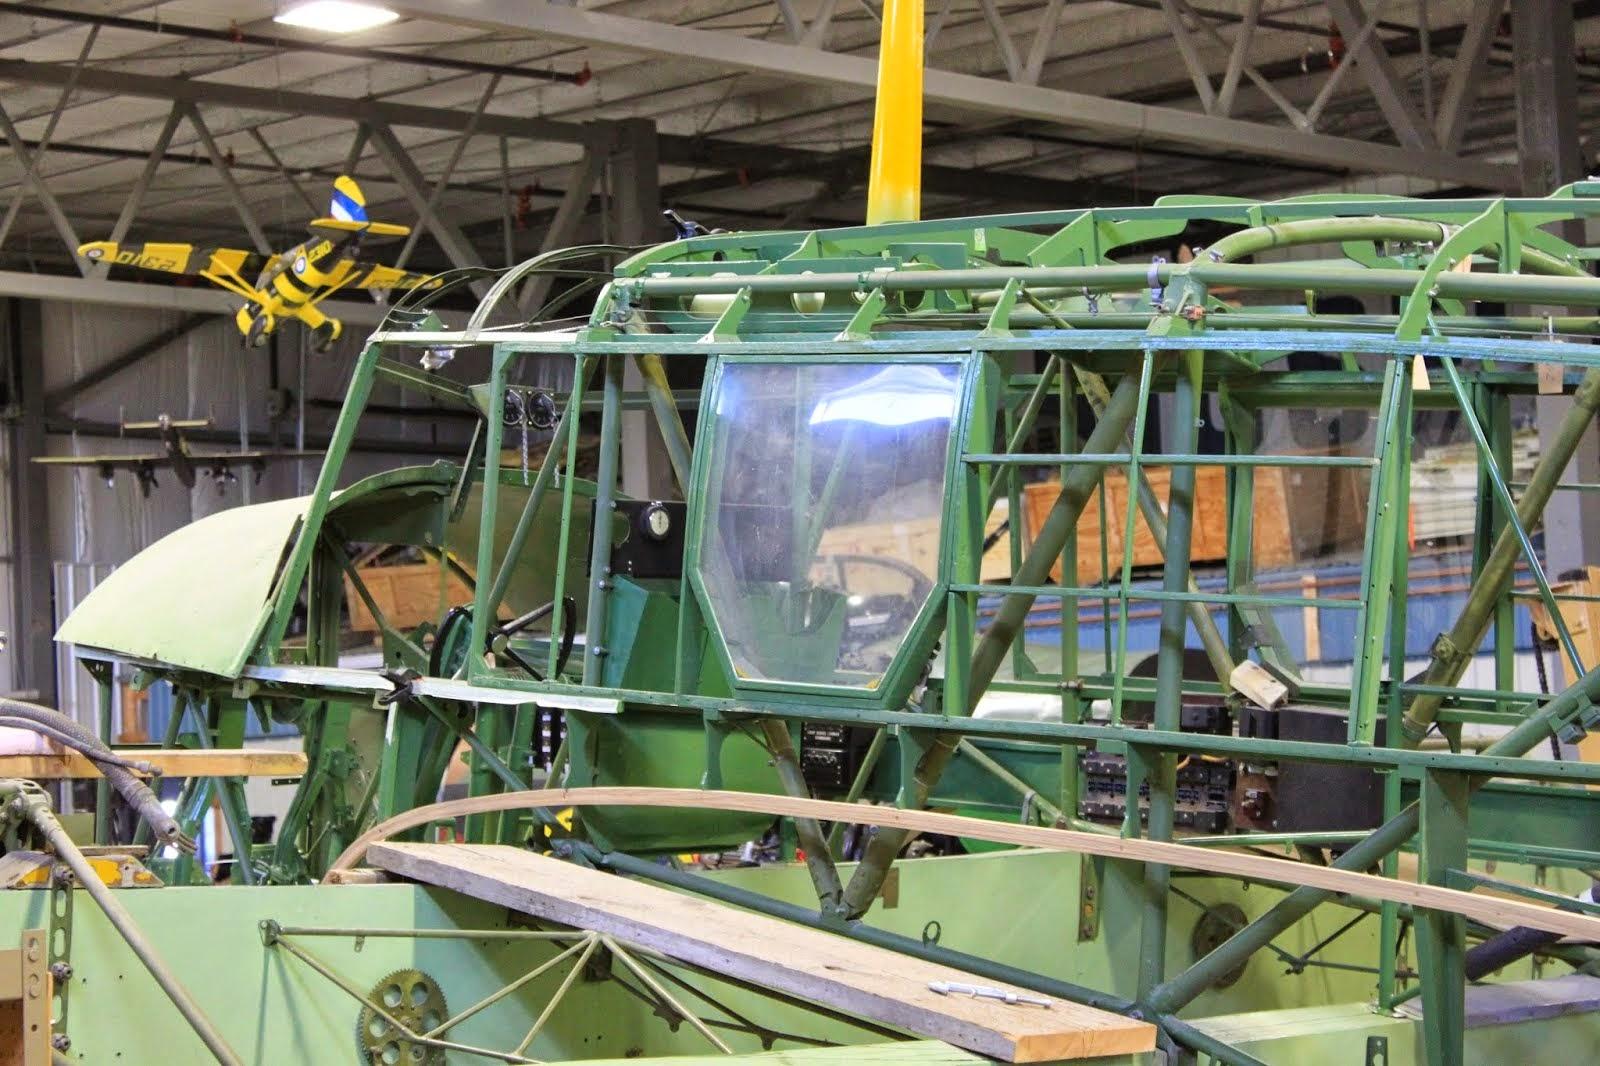 Avro Anson Mk II #7481 Restoration